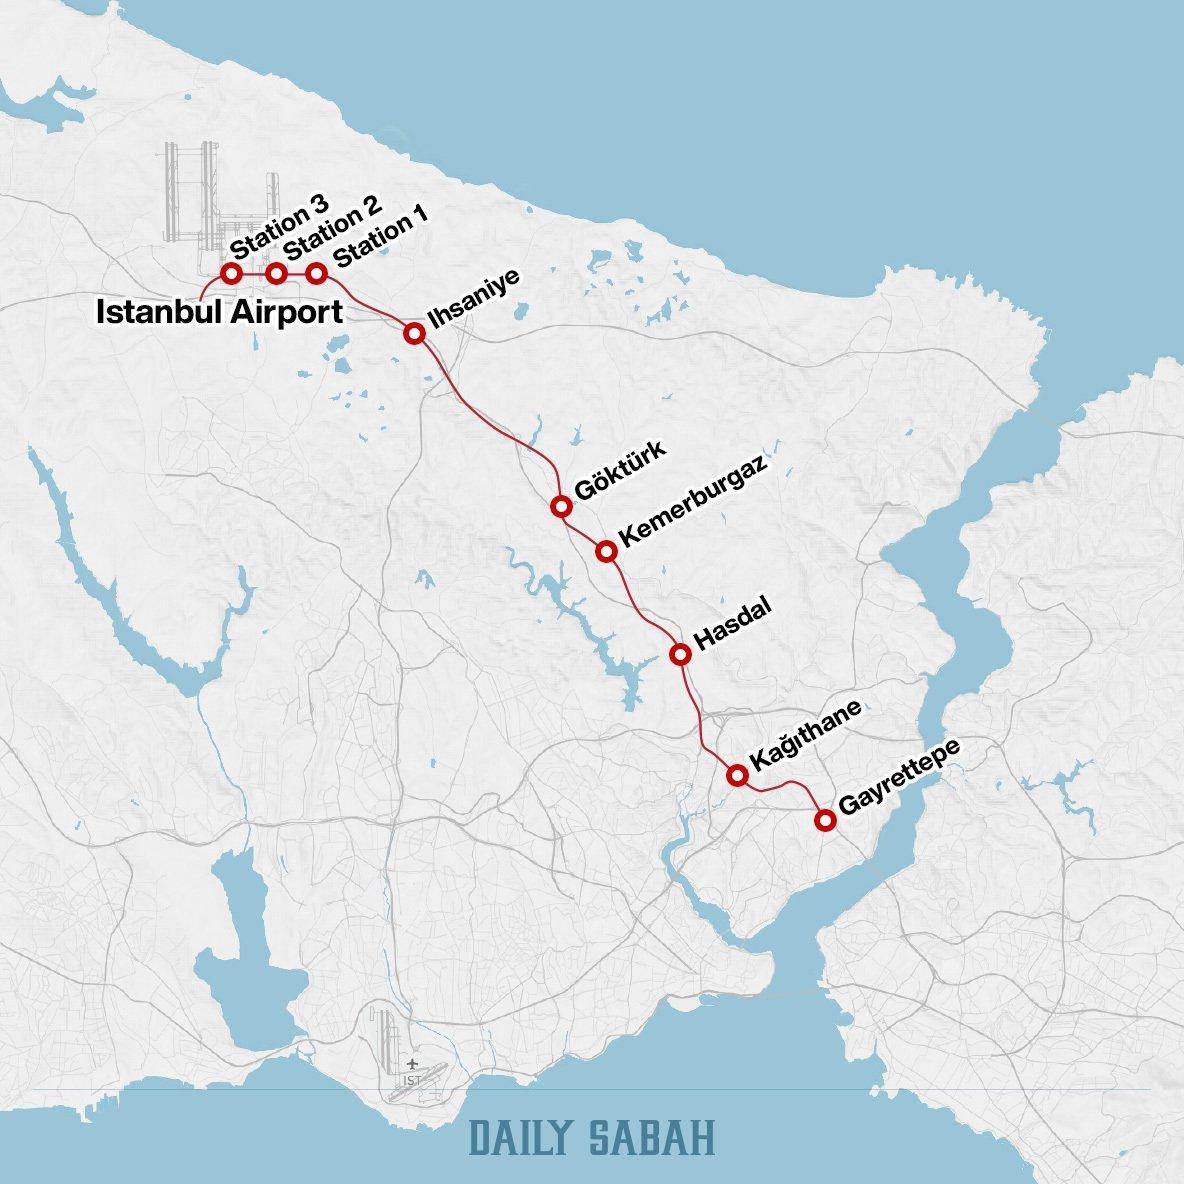 Istanbul Airport - Gayrettepe metro line.